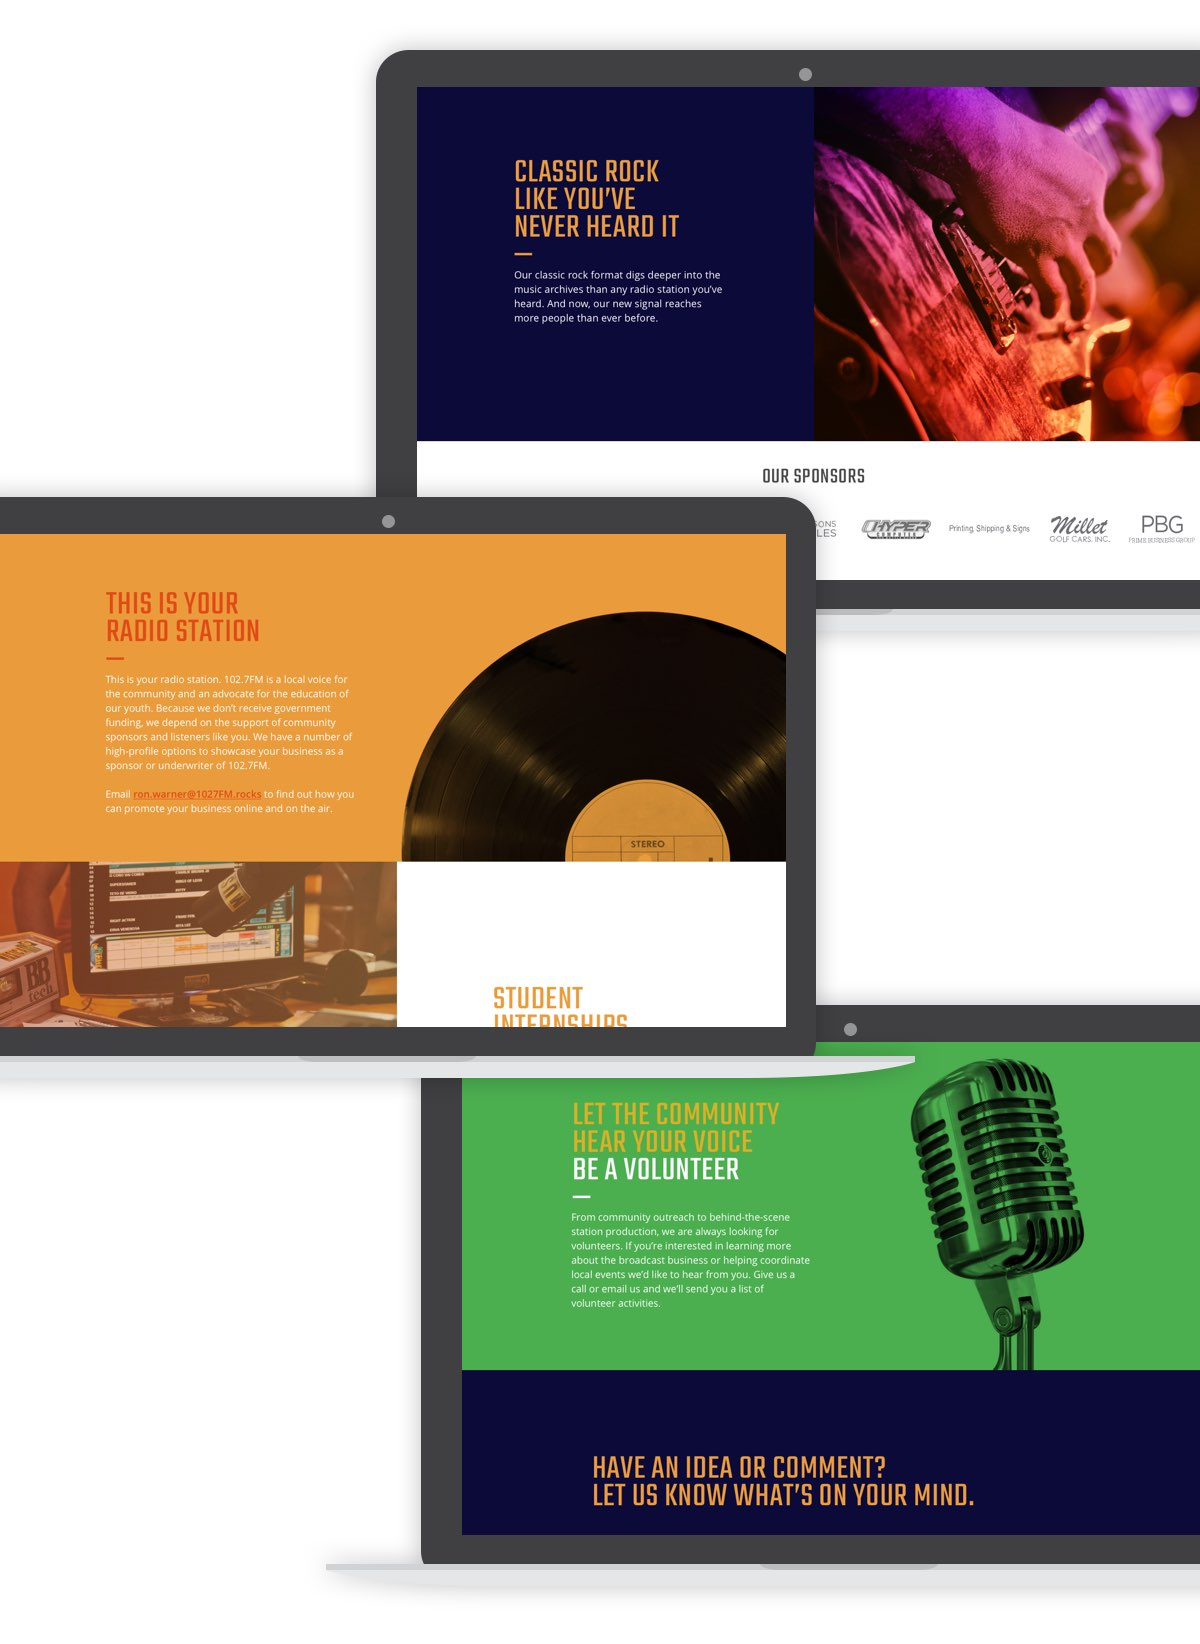 102.7FM desktop screens